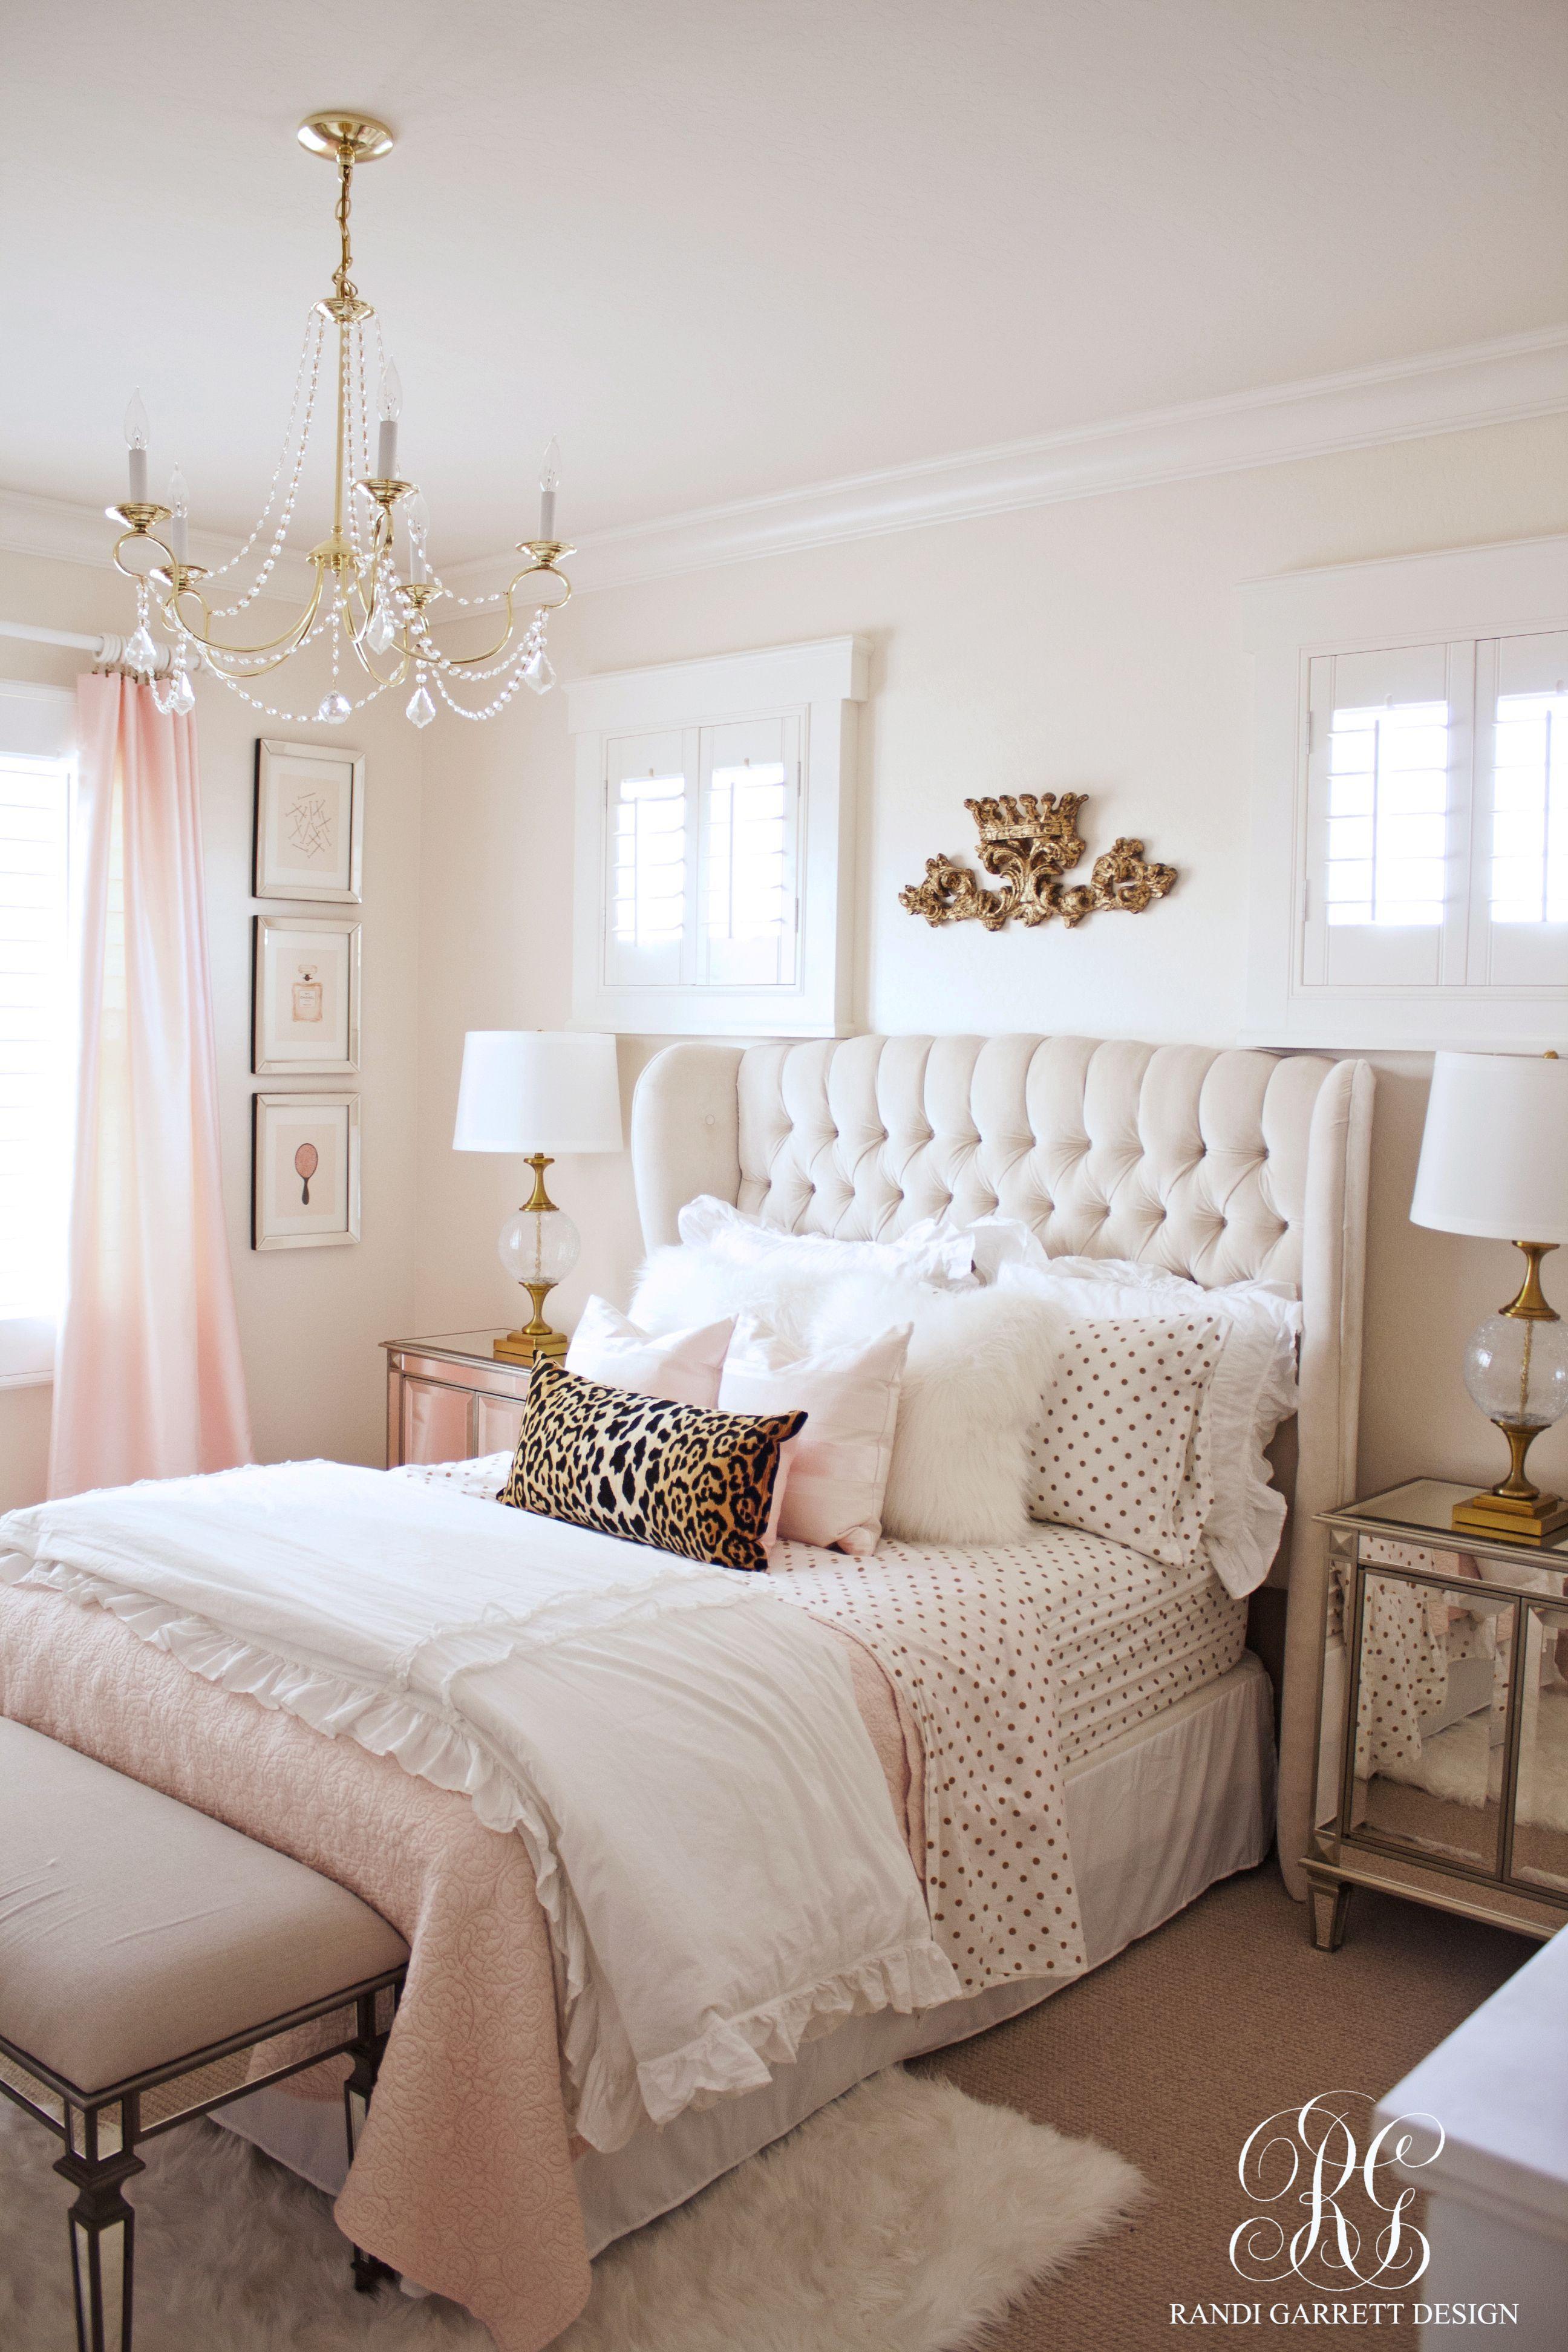 Image Result For Pink And Rose Gold Bedroom Ideas Glavnye Spalni Interery Spalni Devchachi Komnaty